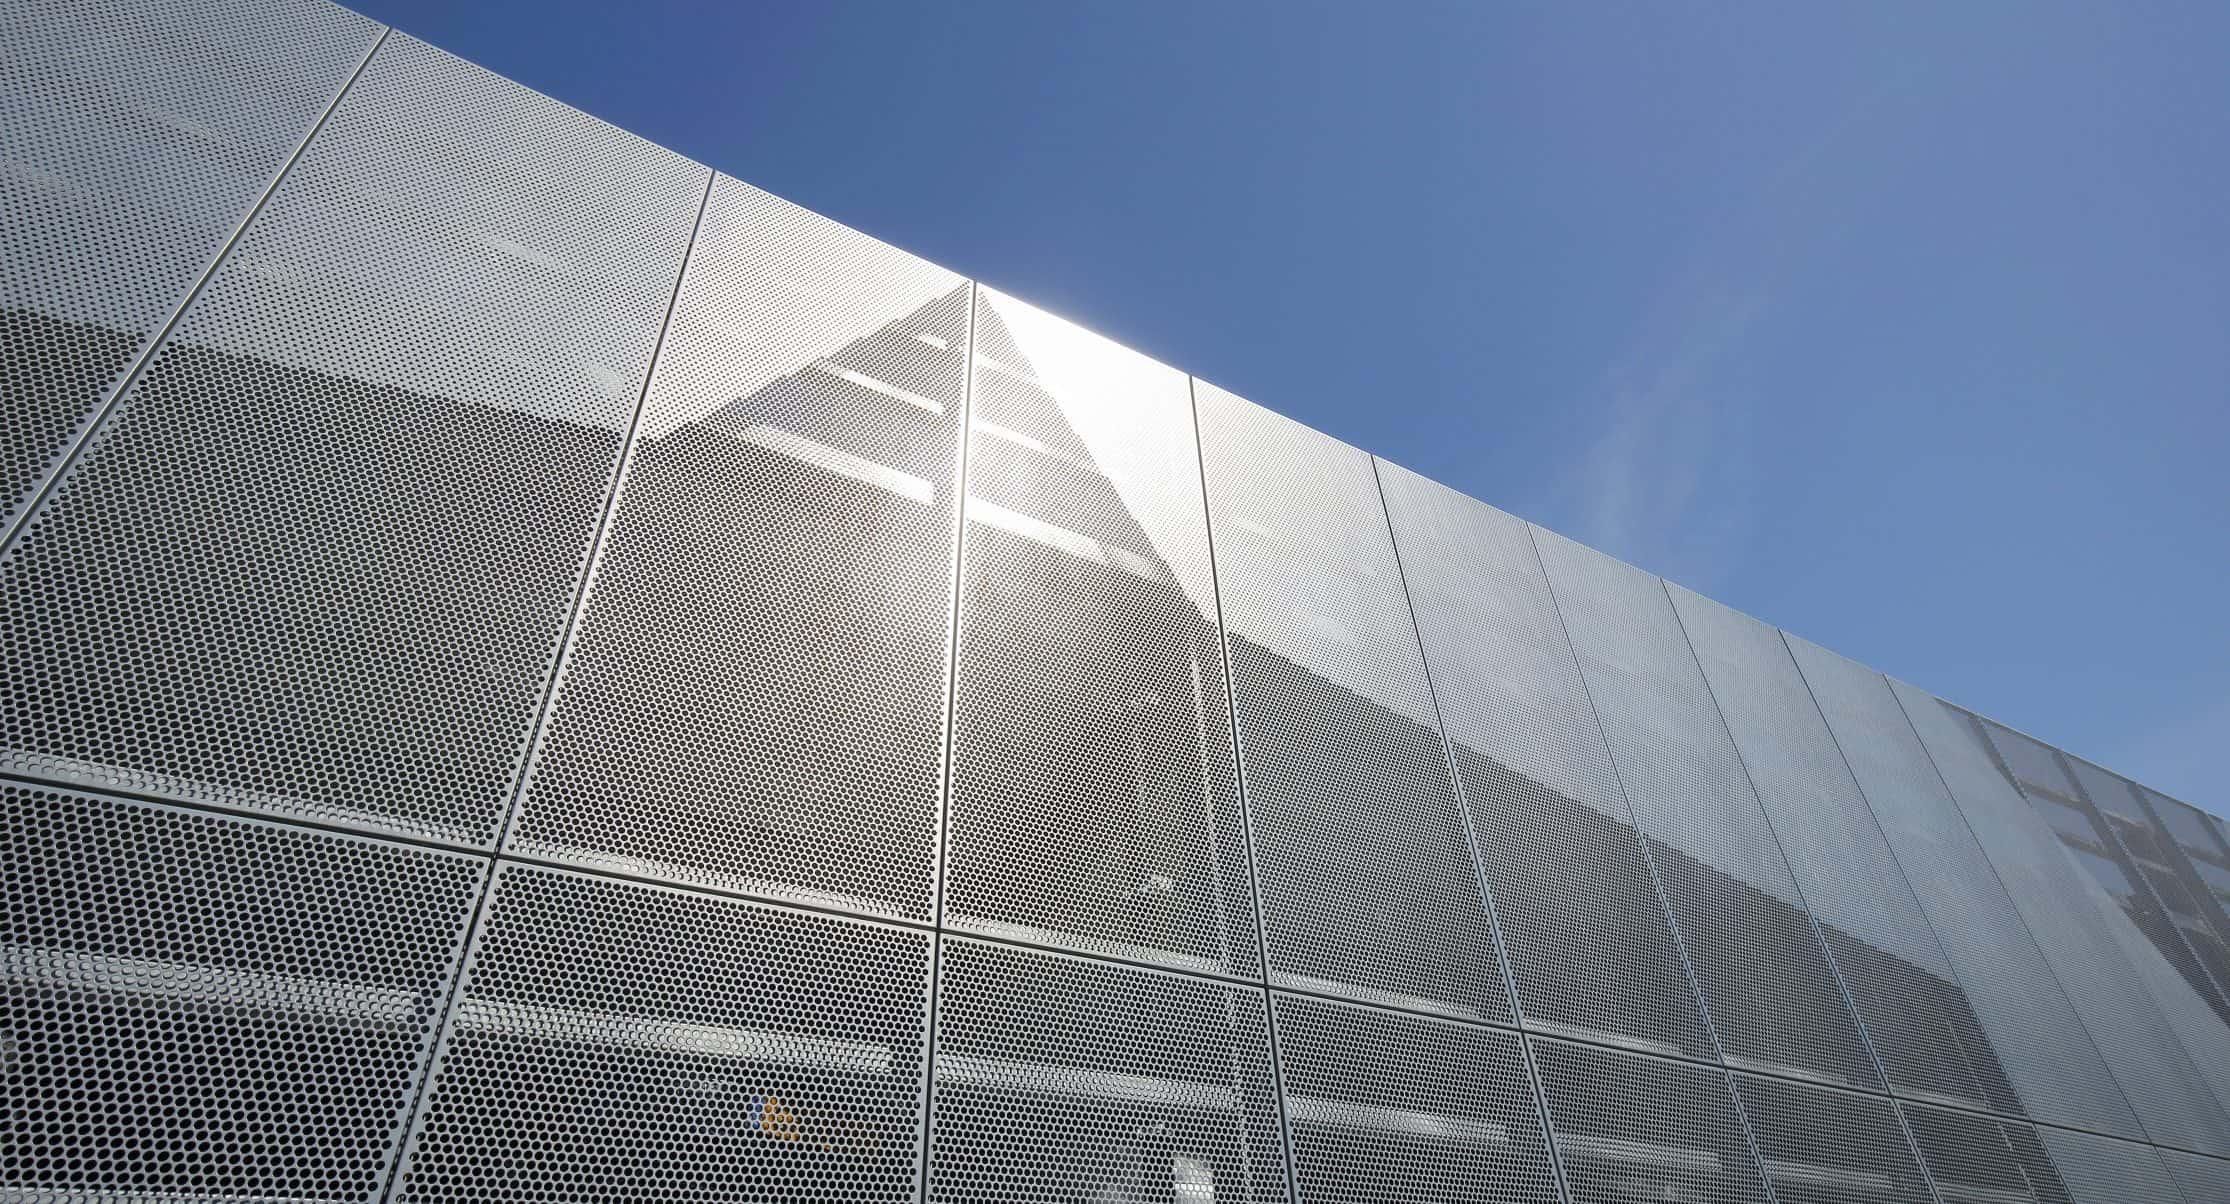 MD Design perforatie gevelbekleding MD Design perforation facade